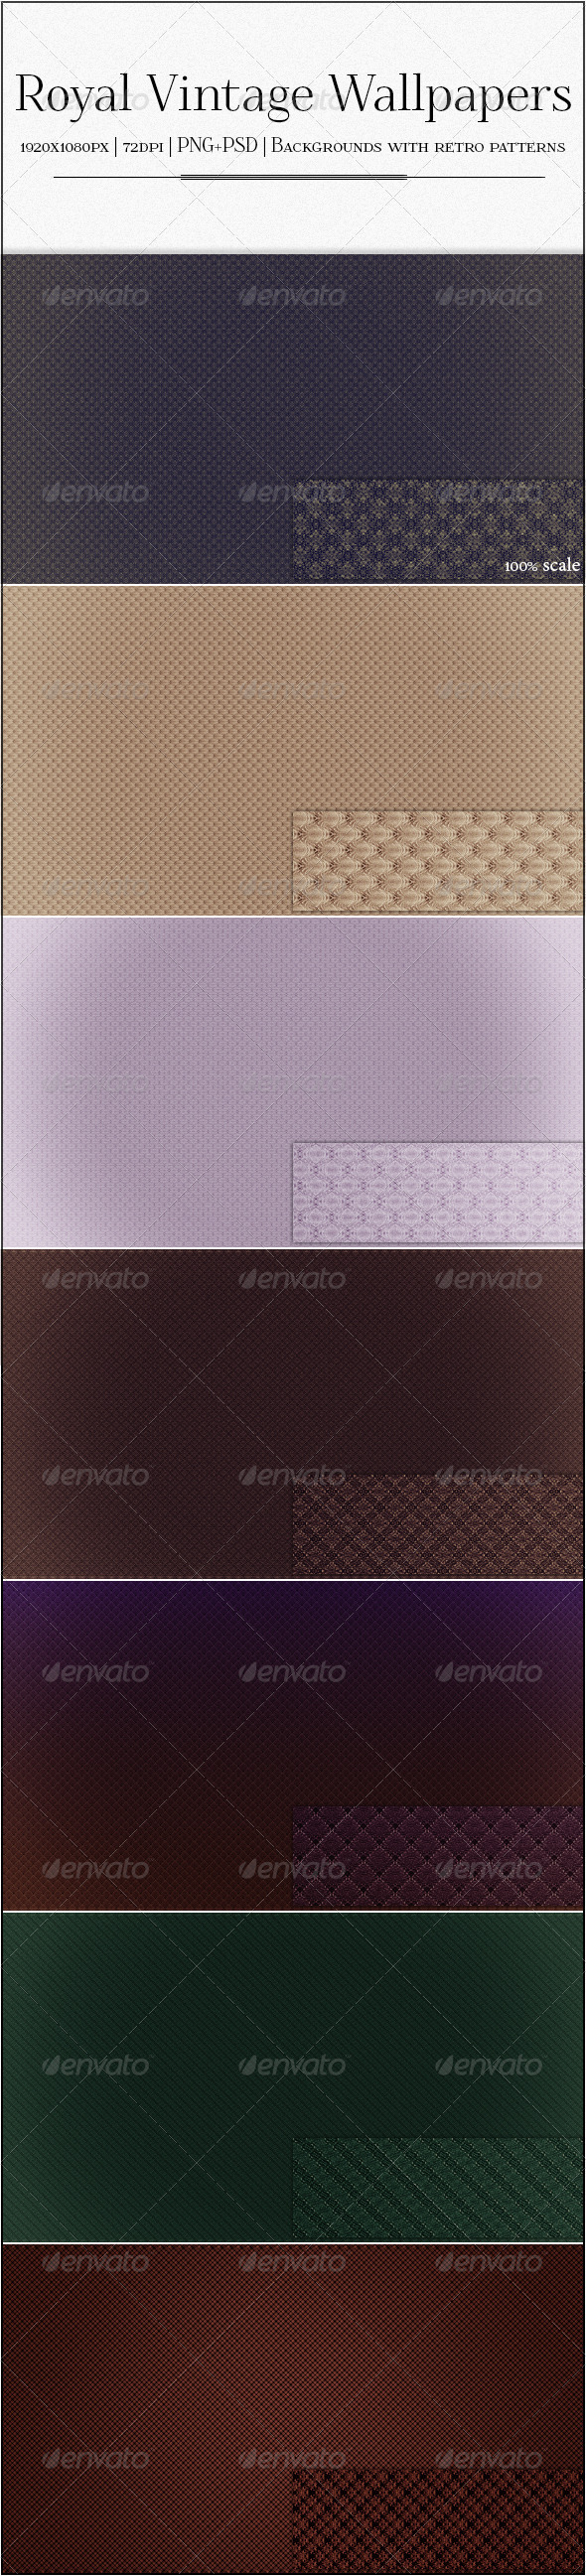 Vintage Royal Wallpapers - 7 Patterned Backgrounds - Patterns Backgrounds